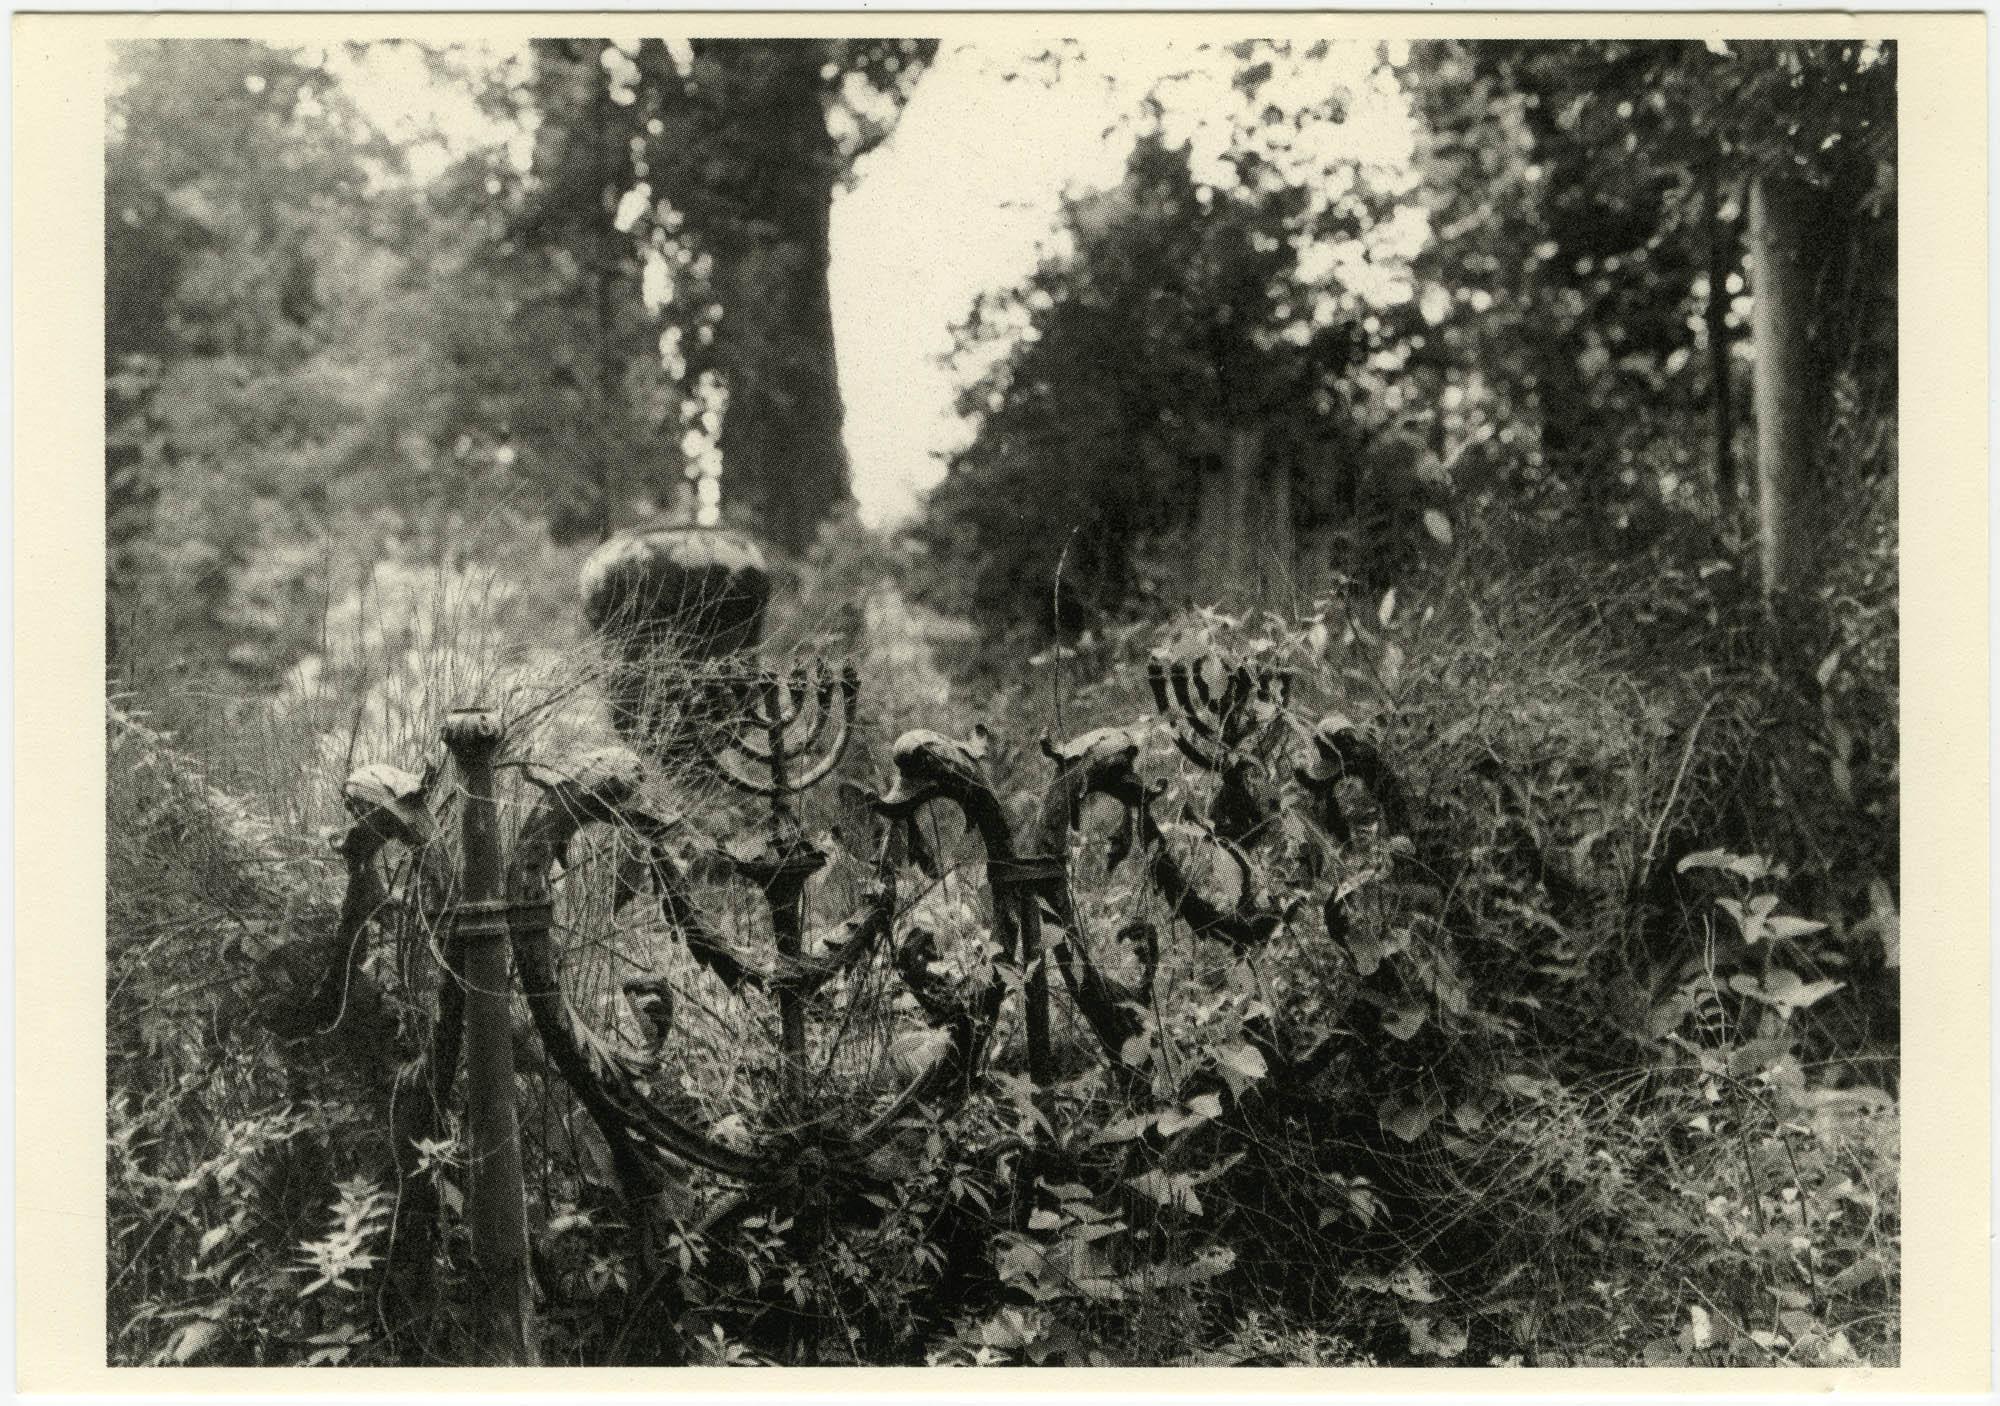 Cimitero Israelitico, Lido, Venezia